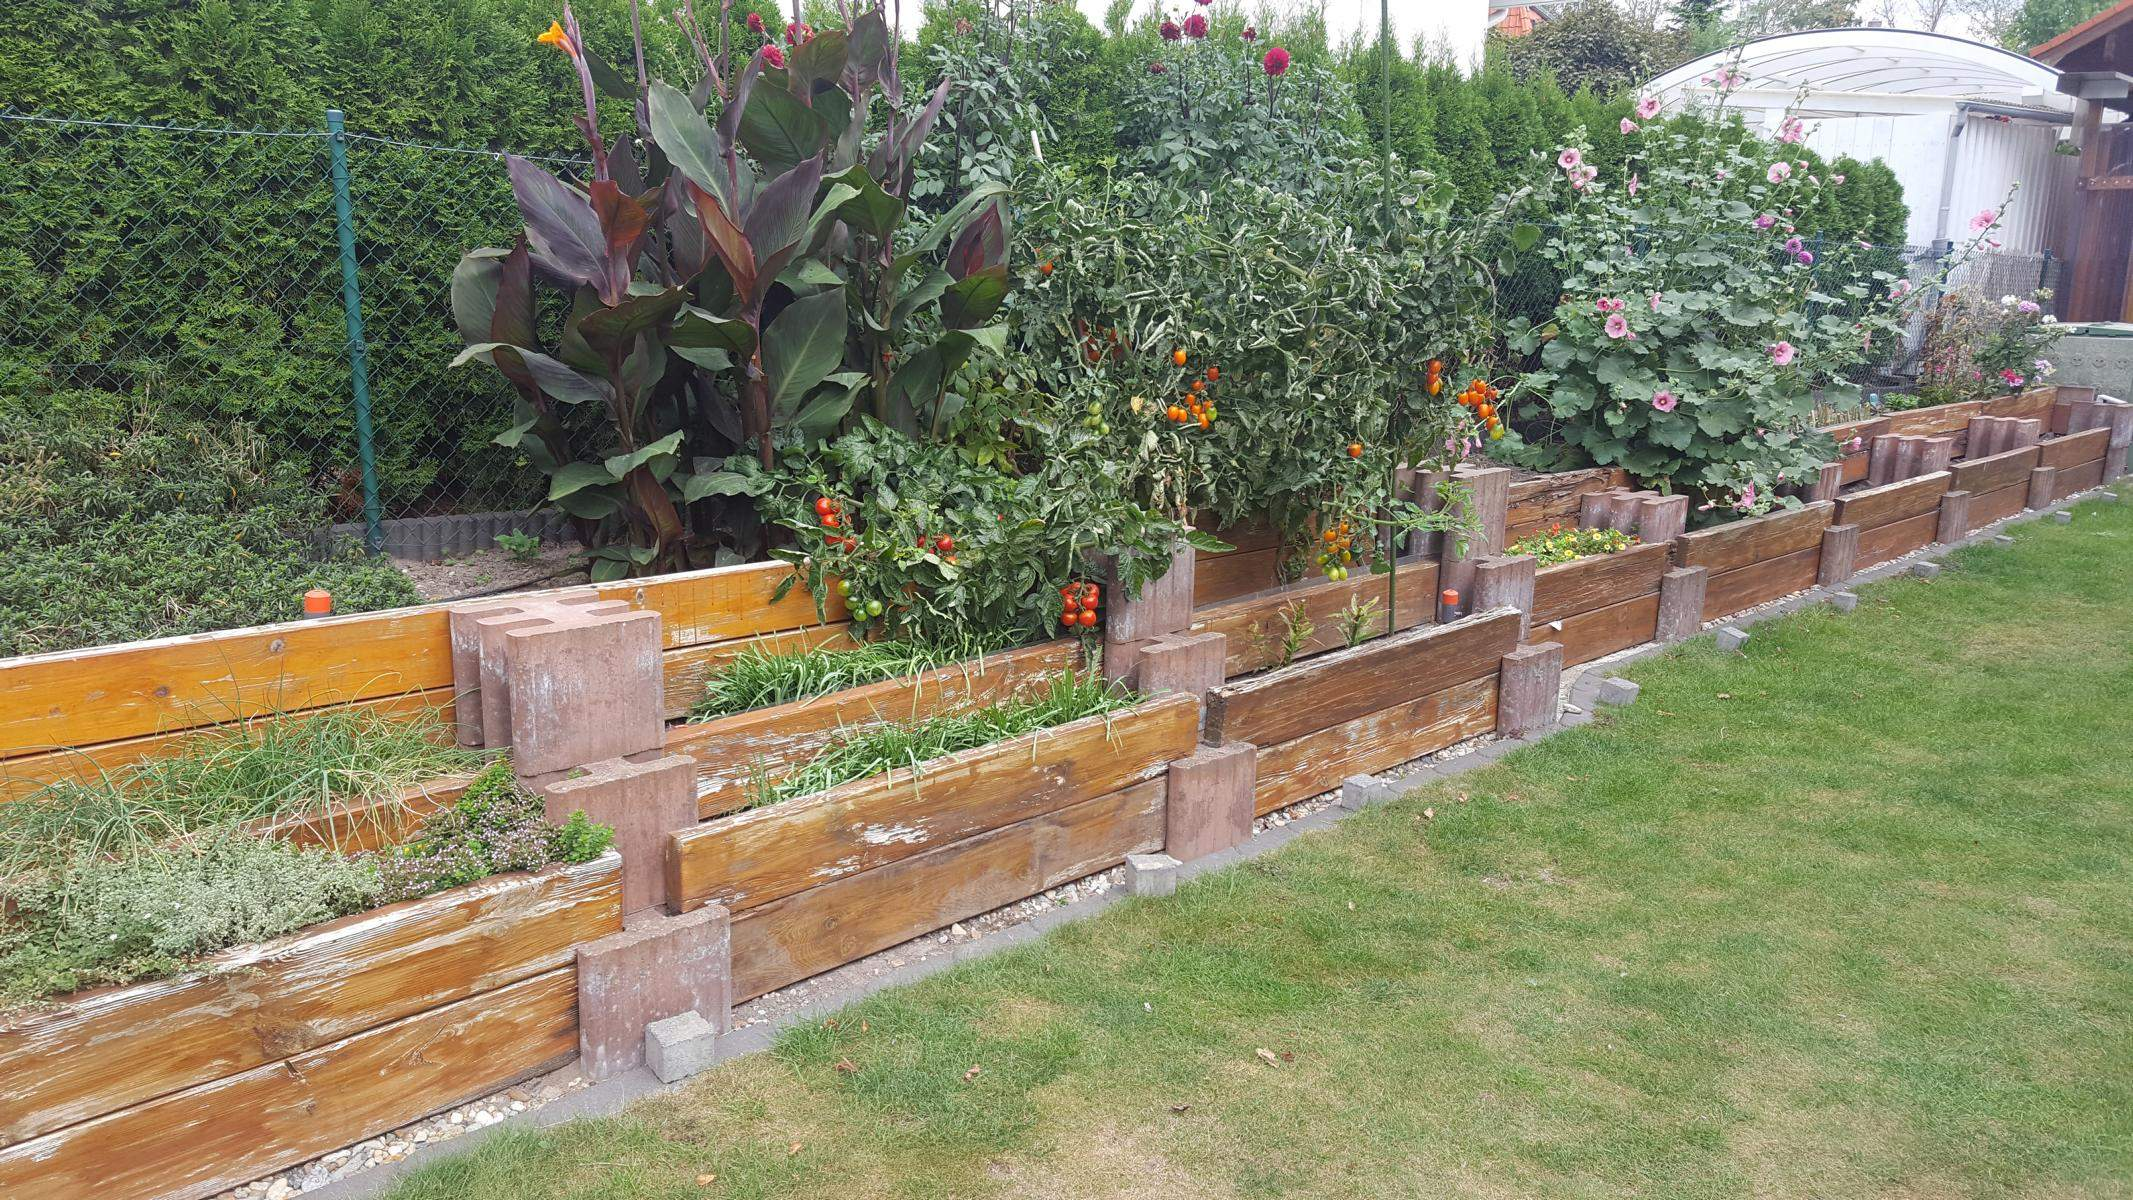 Hangsicherung Garten Luxus Hangbefestigung Hangsicherung Beton Systemstein